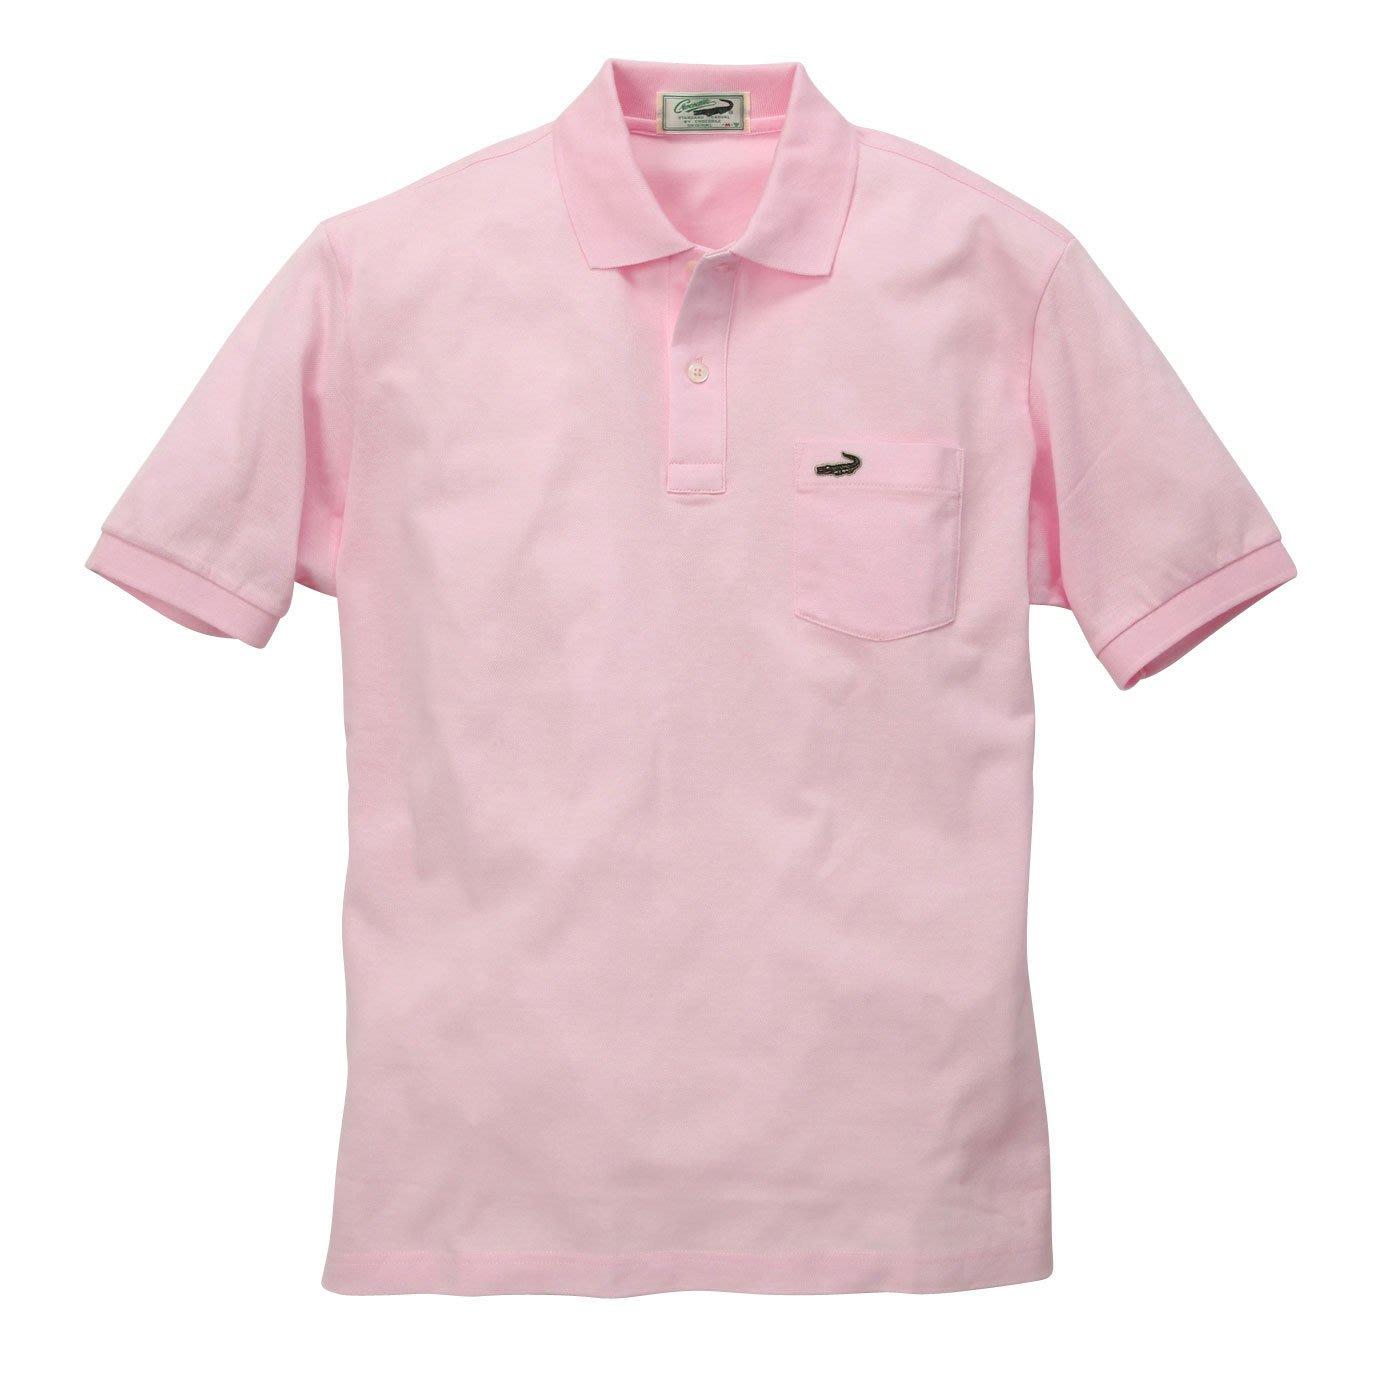 ☆注目の日本製Crocodile 夏新款粉紅色鱷魚logo短袖Polo綿衫☆